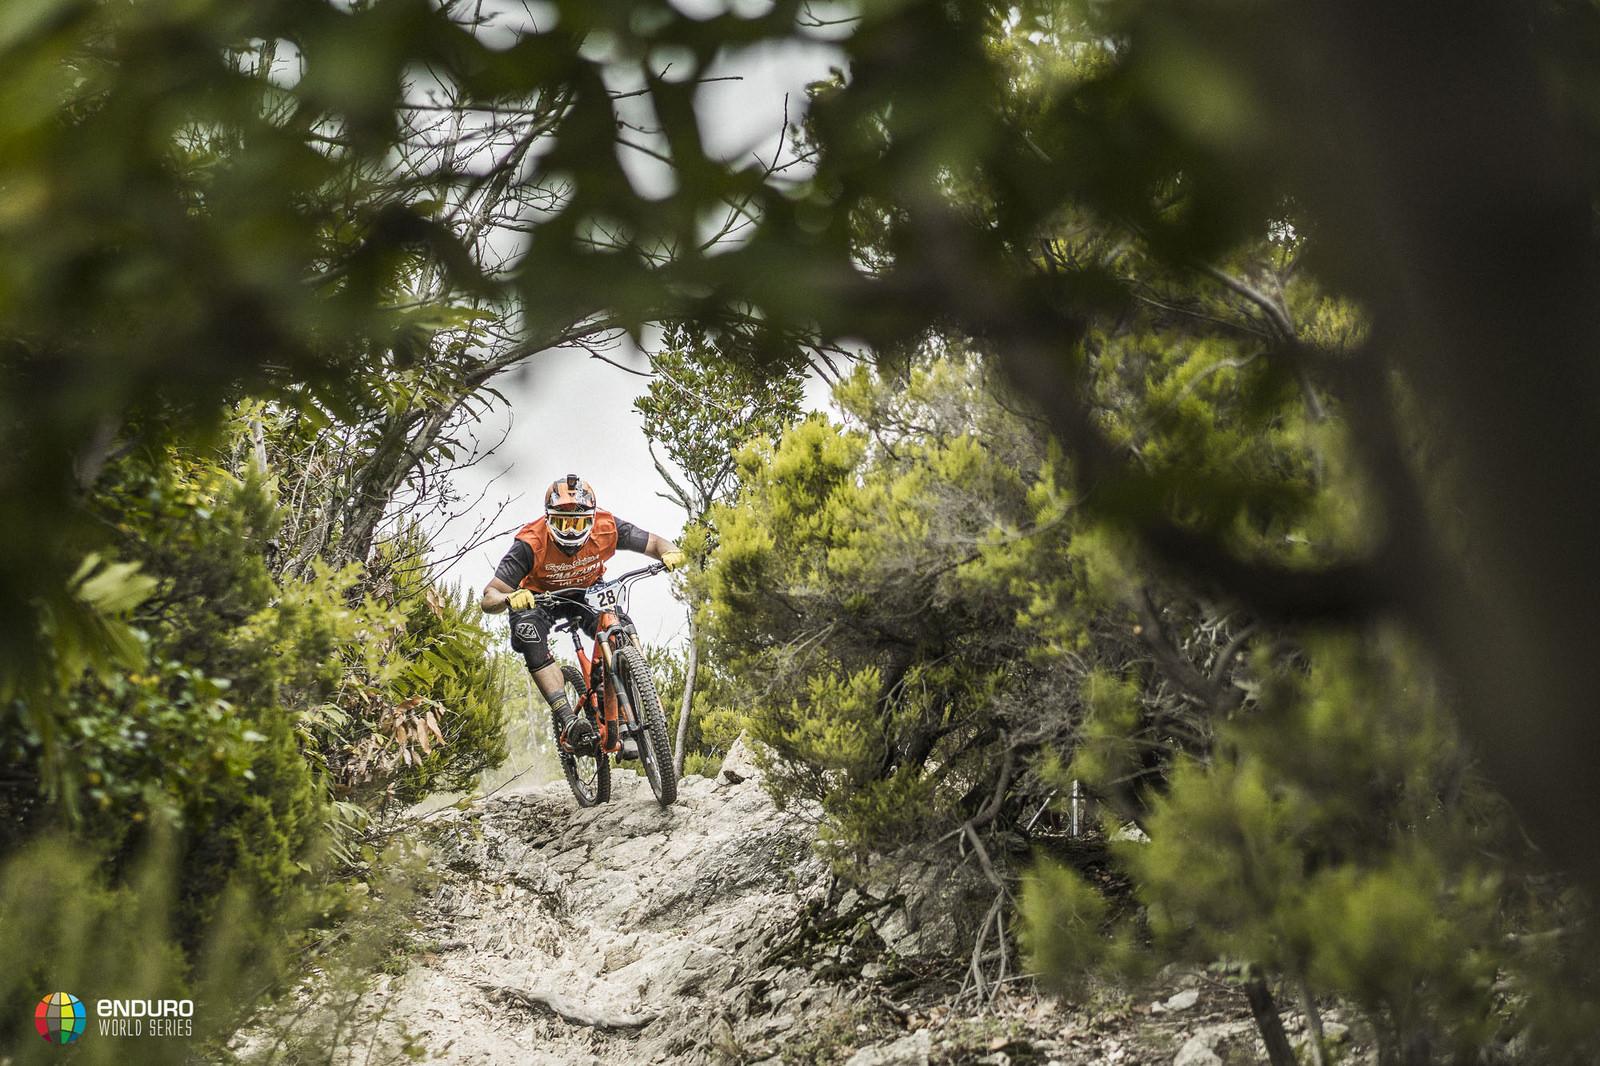 Mountain-bike-Finale-Ligure-3